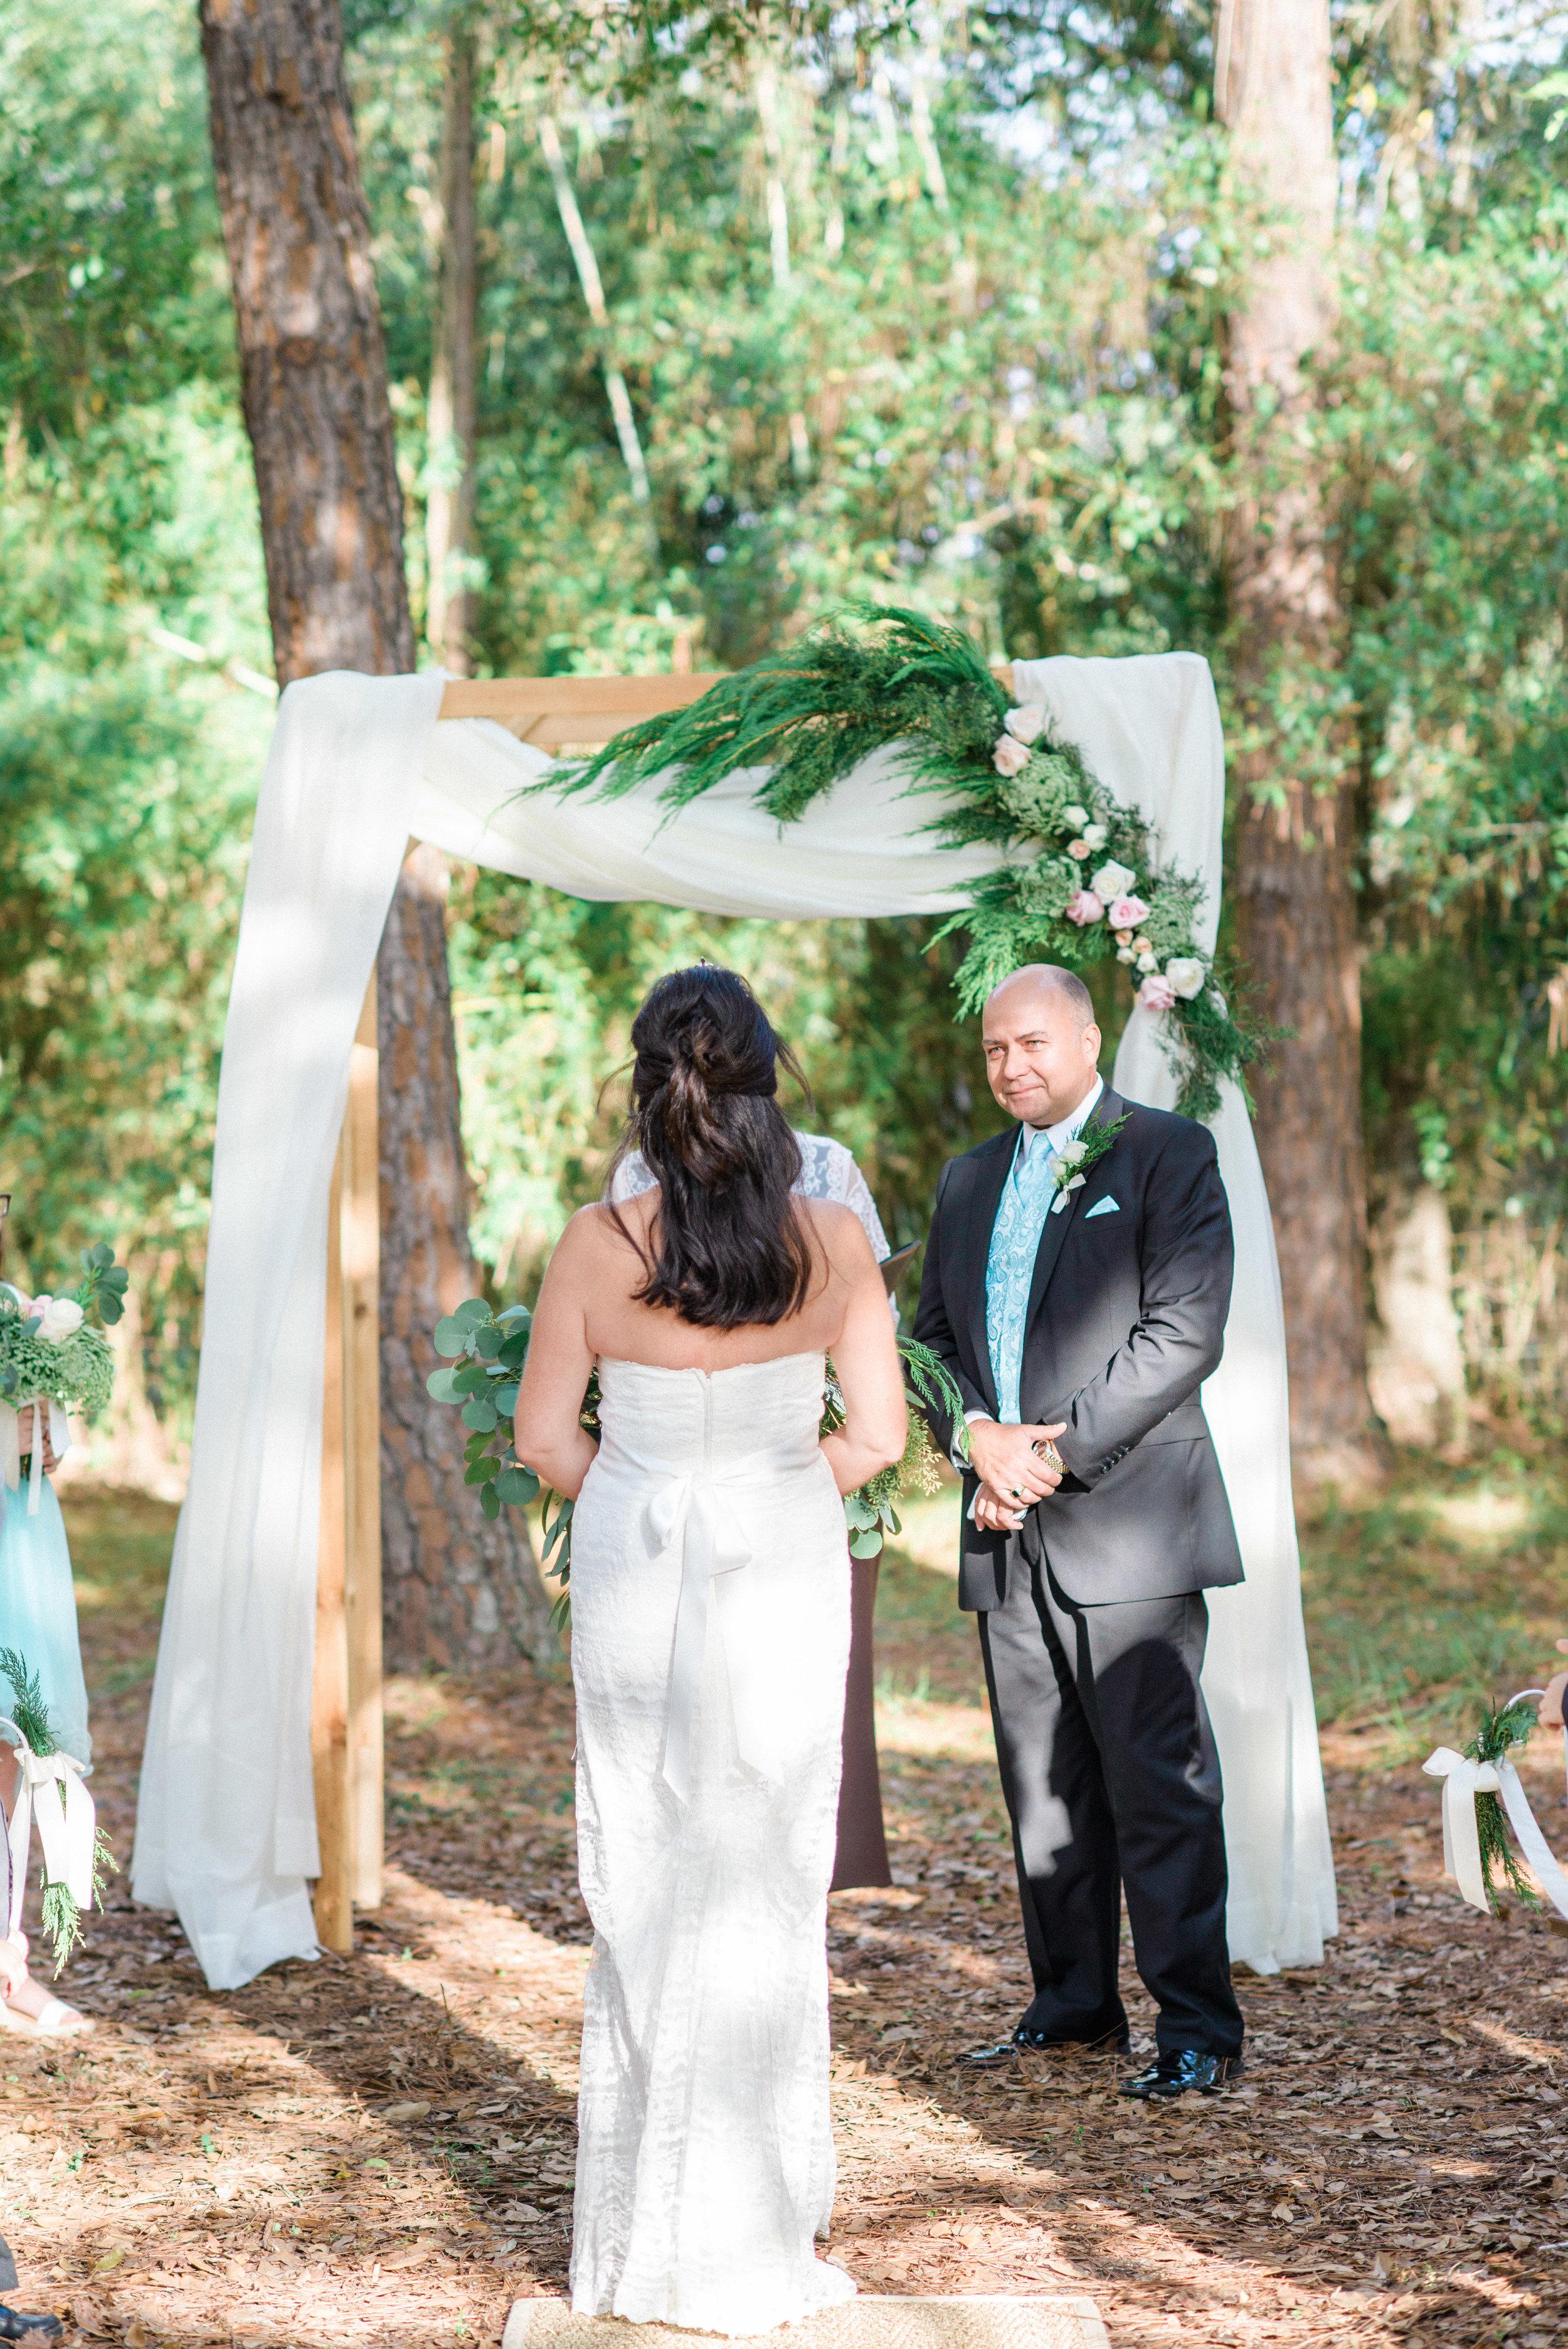 Ever-After-Vintage-Weddings-Nicole-Wedding-110.jpg